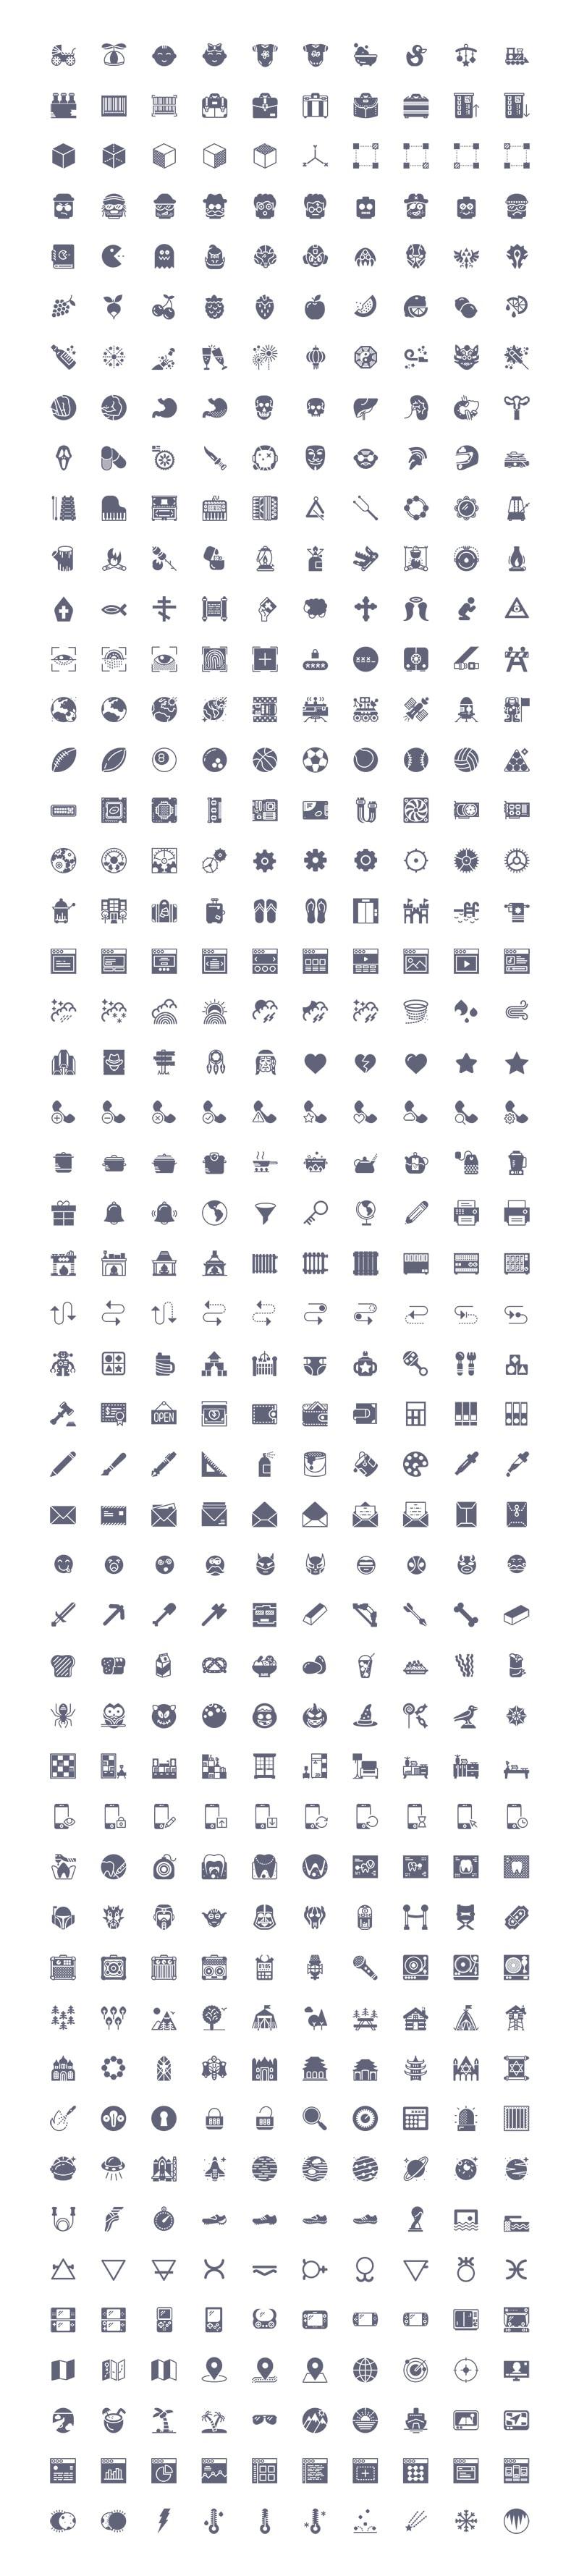 Smashicons: 300 Free Icons 2